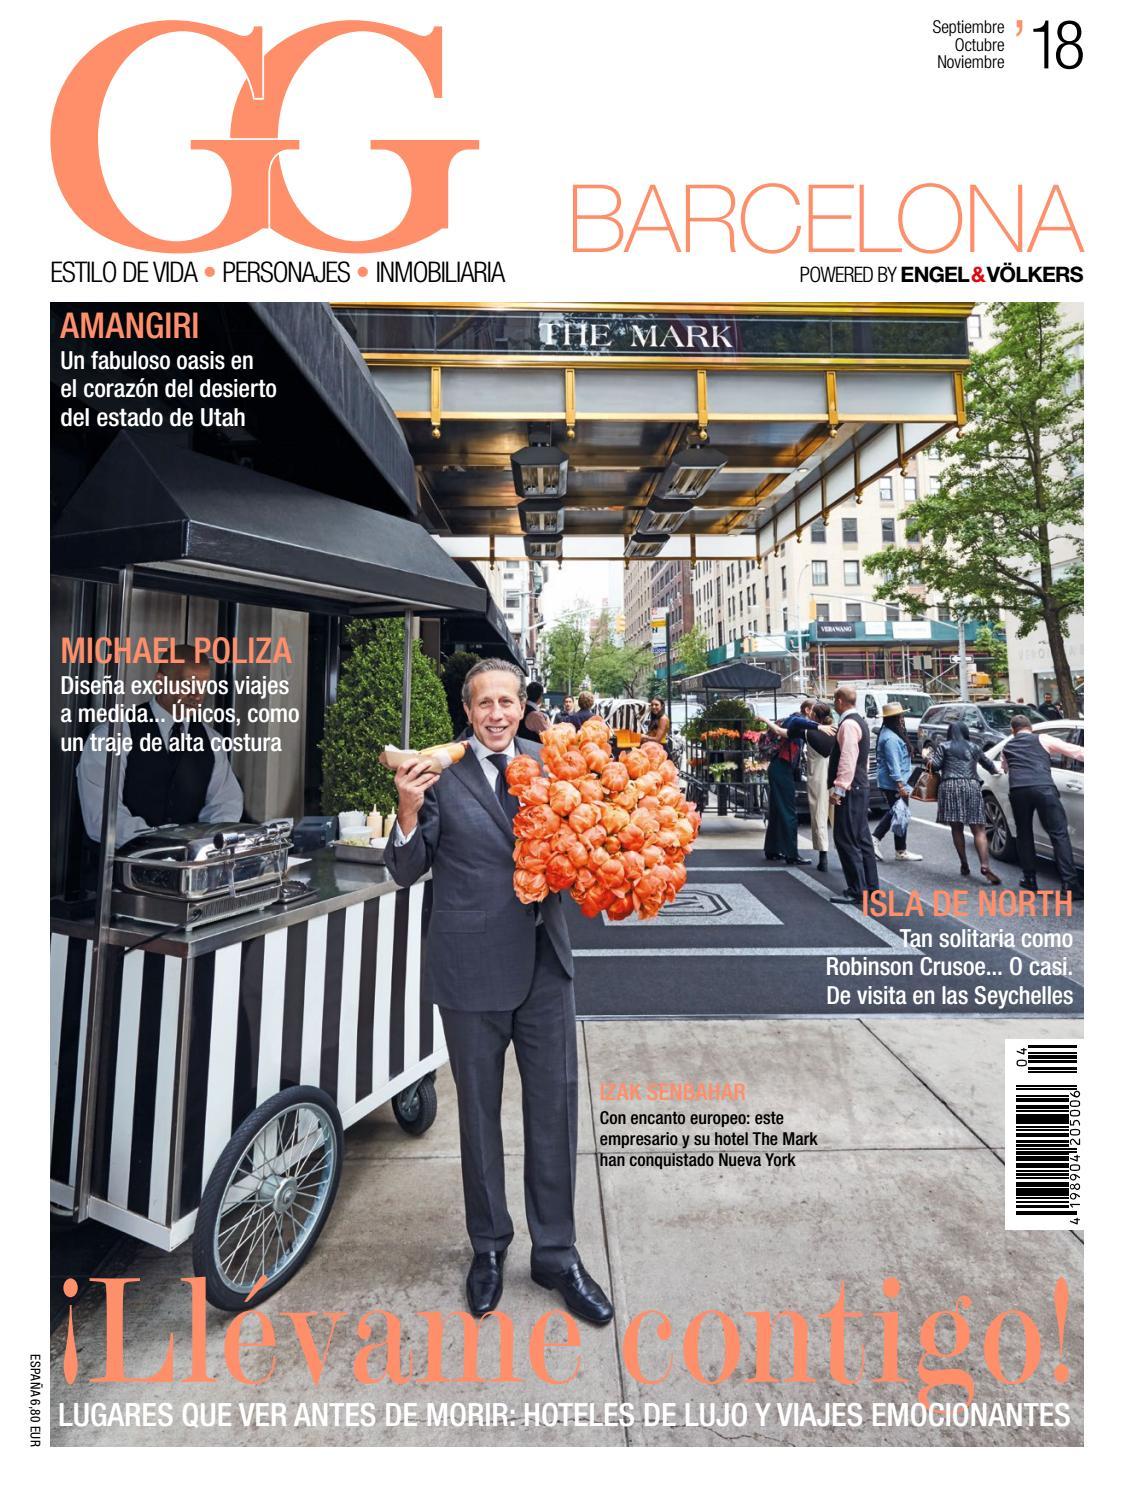 GG Magazine 04 18 Barcelona by GG-Magazine - issuu 36c21505e905d